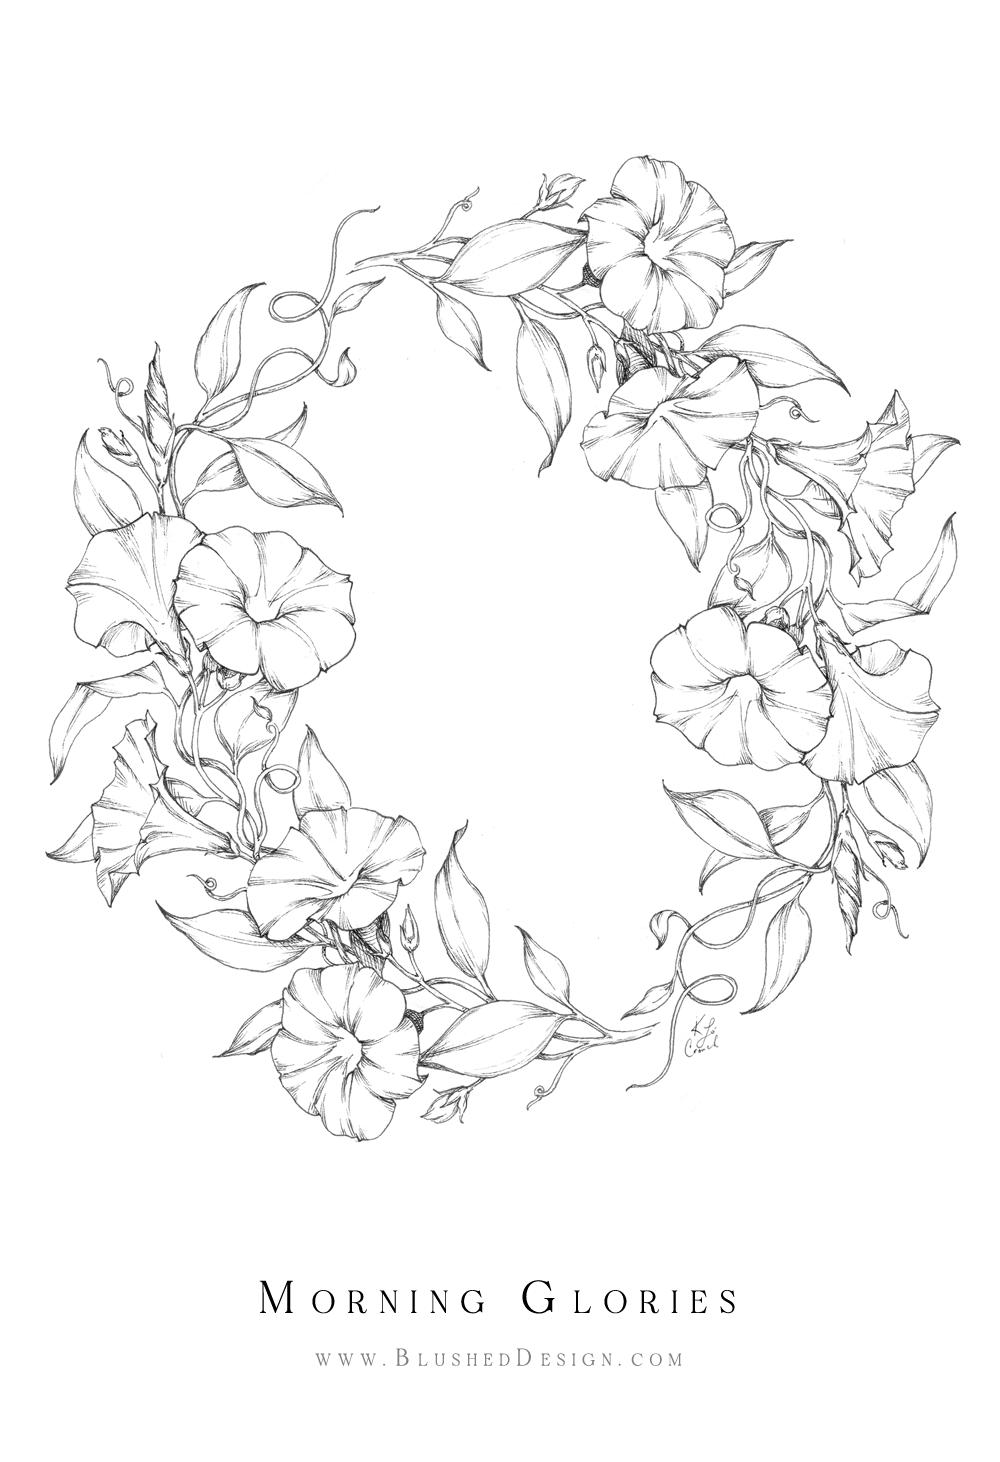 Inktober Flower Drawings 2019 — Blushed Design in 2020